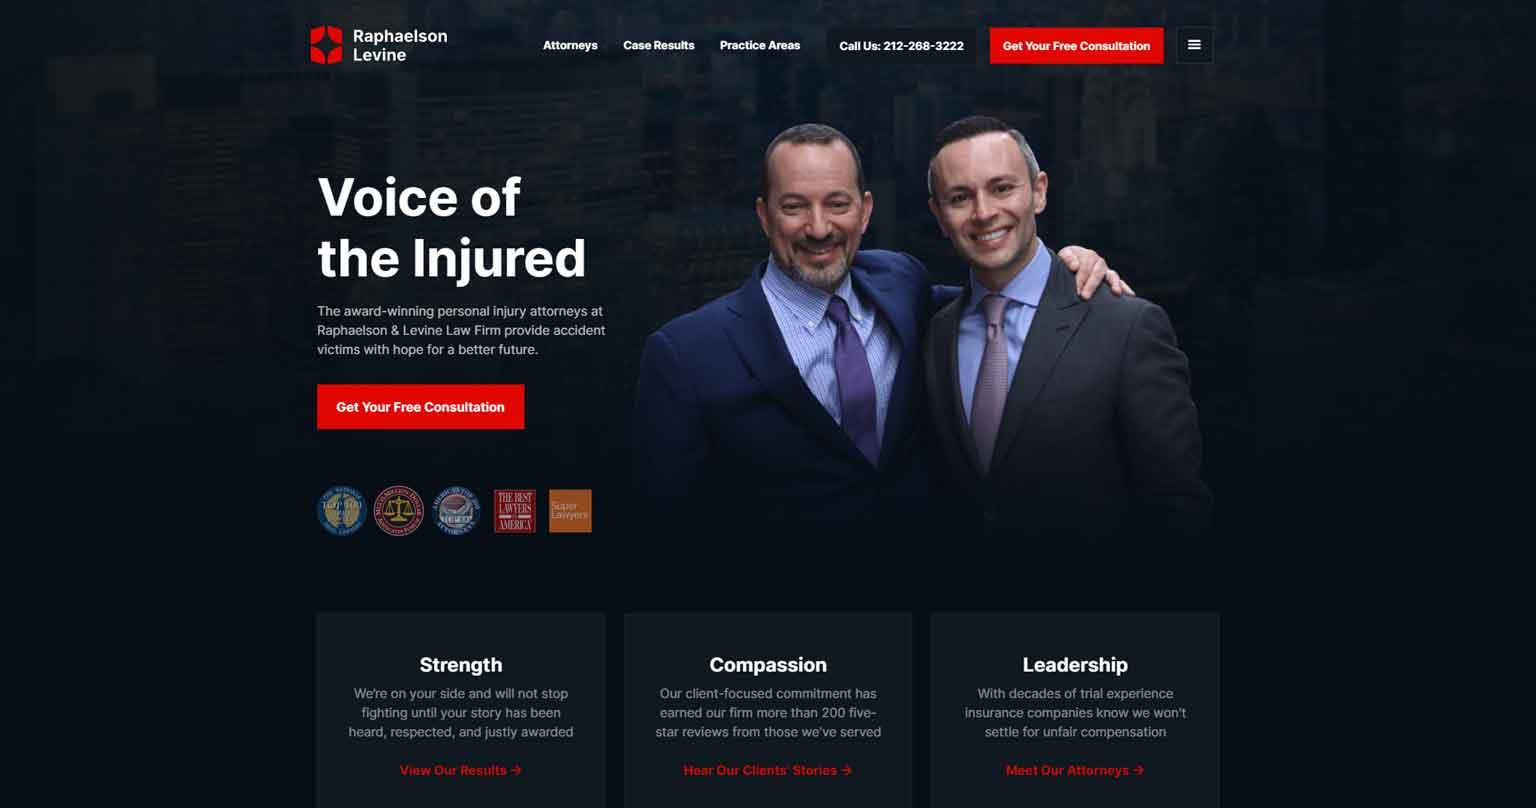 lawyer website example #1